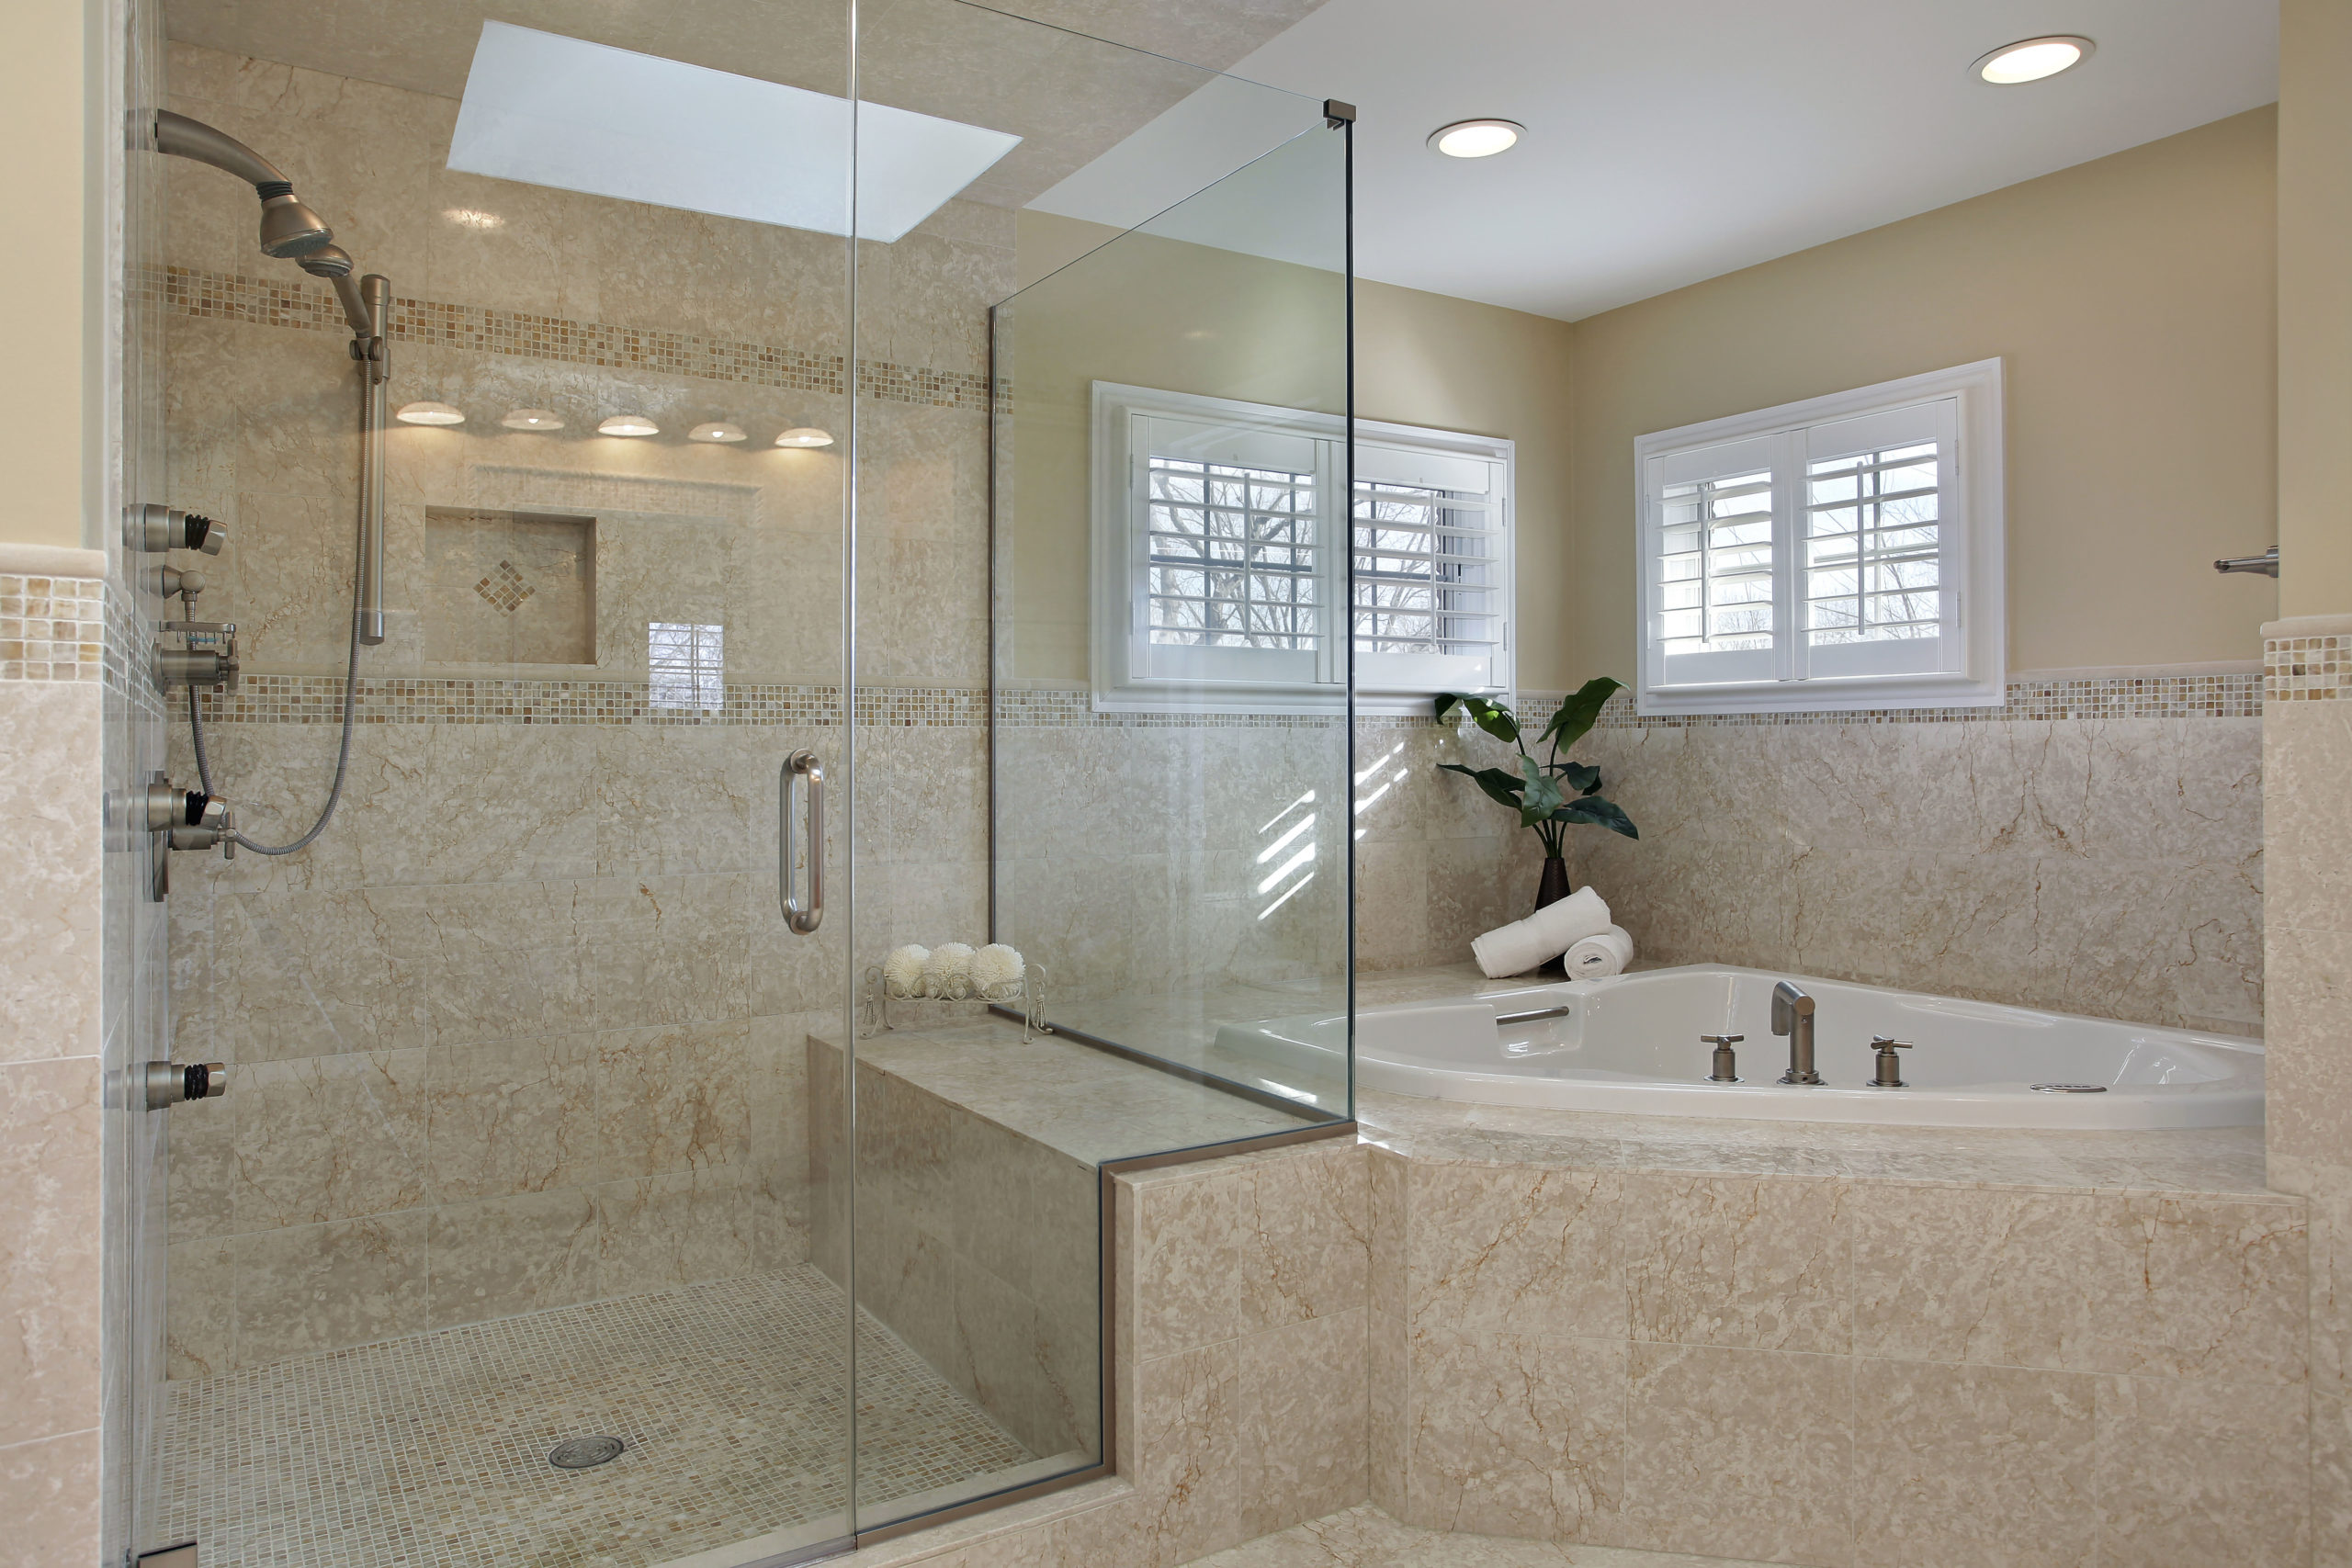 bathroom-remodel-walk-in-shower-with-shower-bench